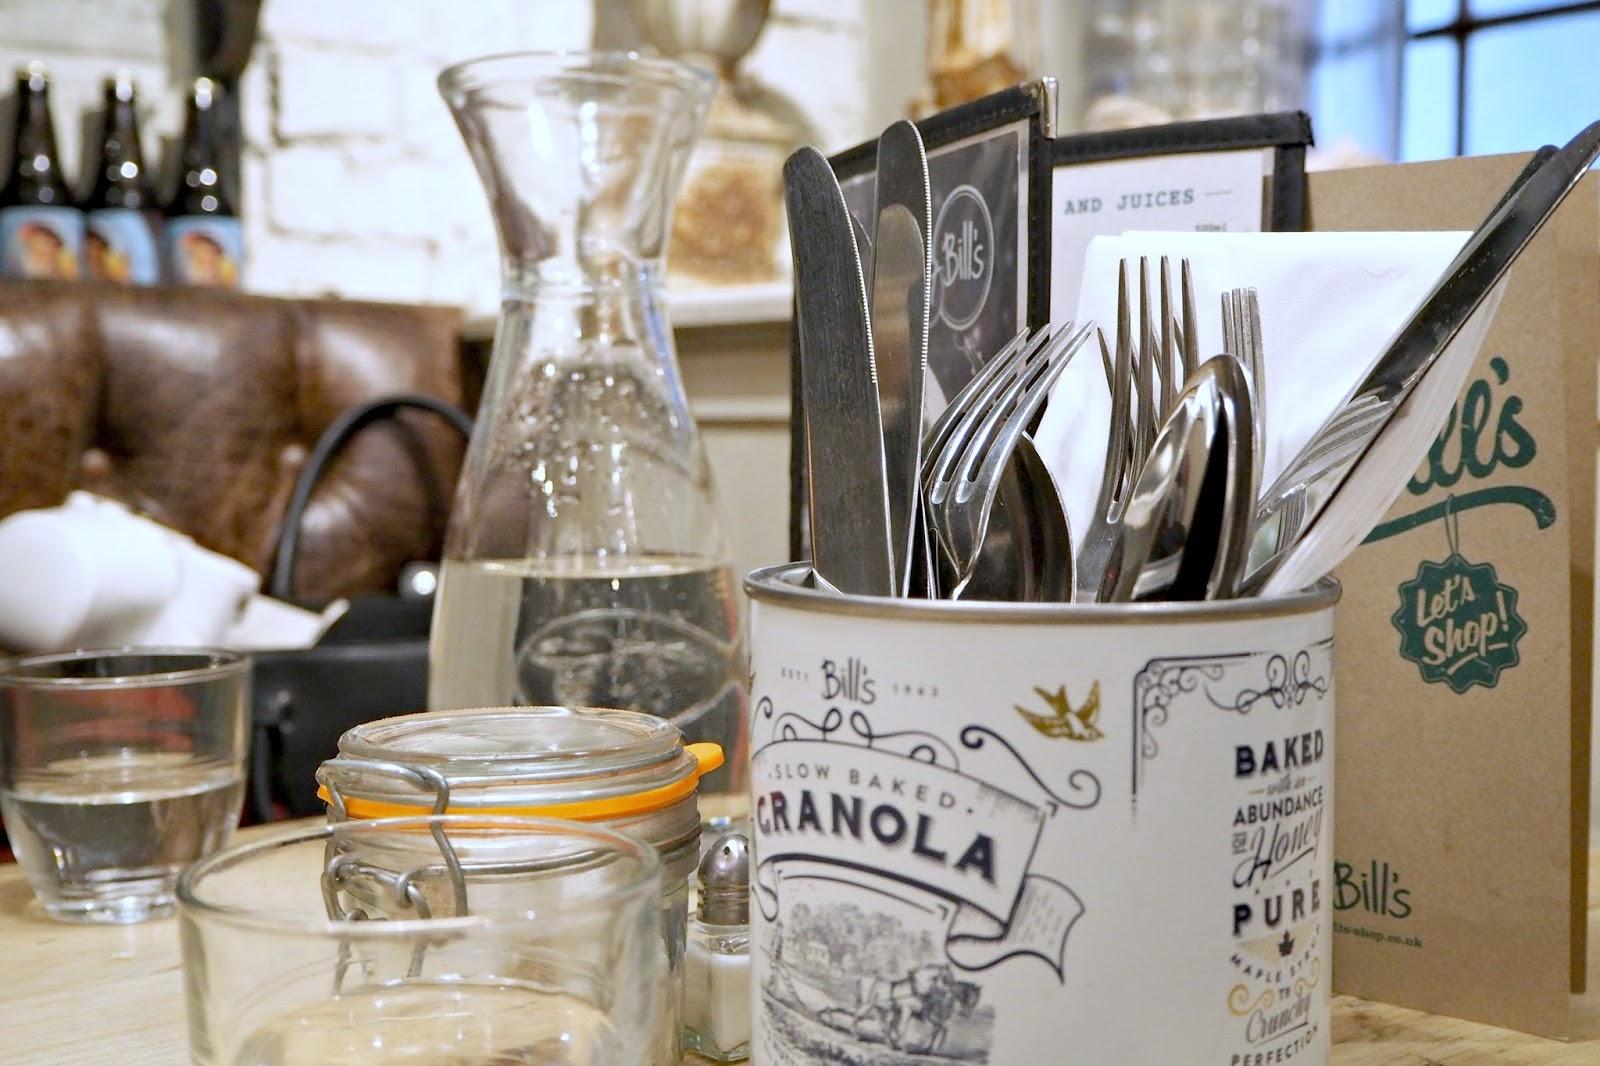 bills restaurant review, copper garden, fashion and lifestyle blogger,